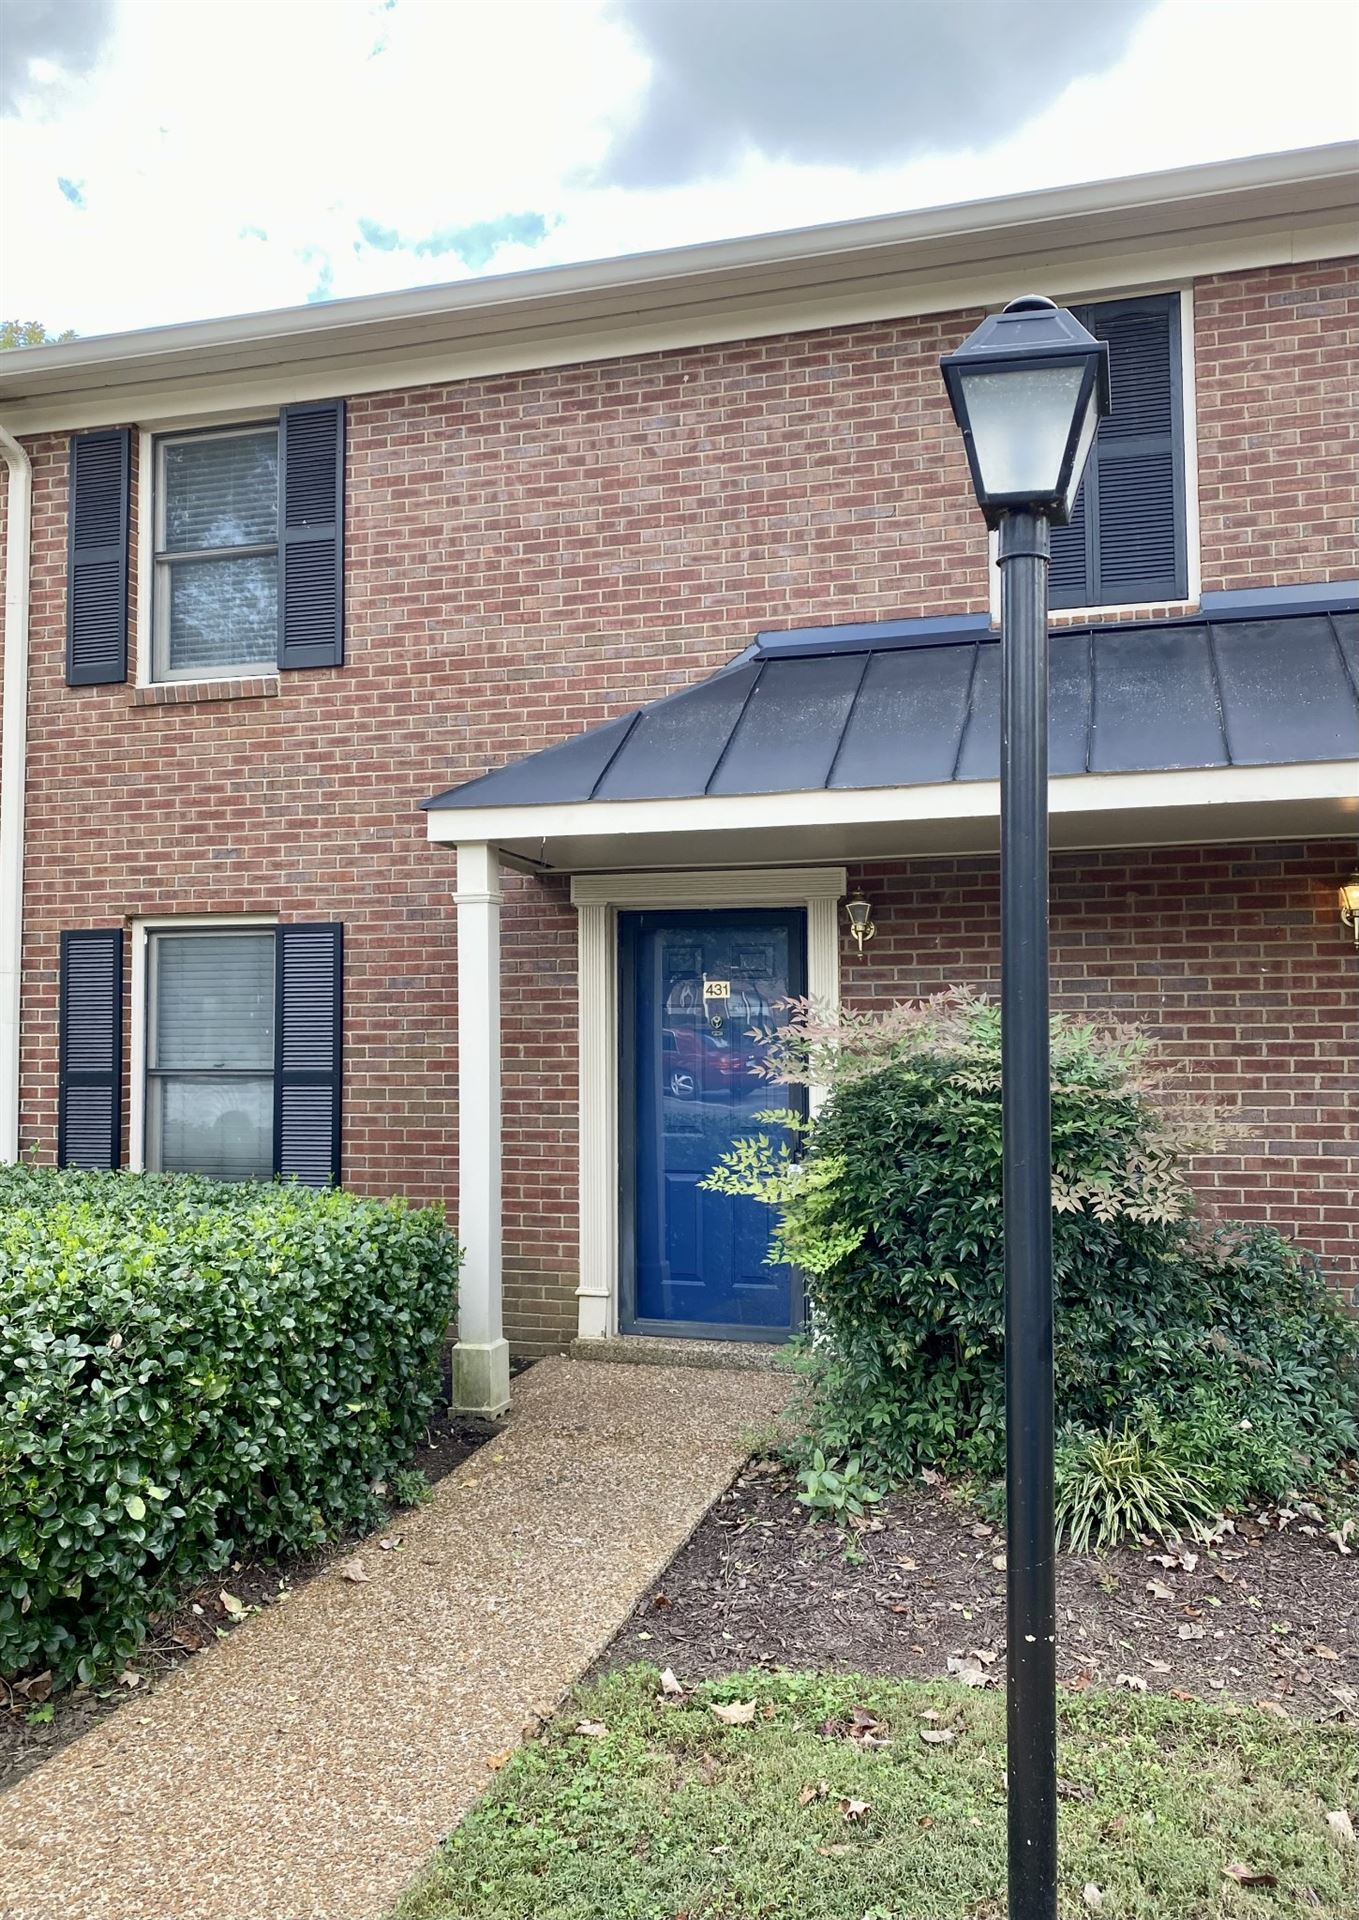 431 Westfield Drive #431, Nashville, TN 37221 - MLS#: 2300104